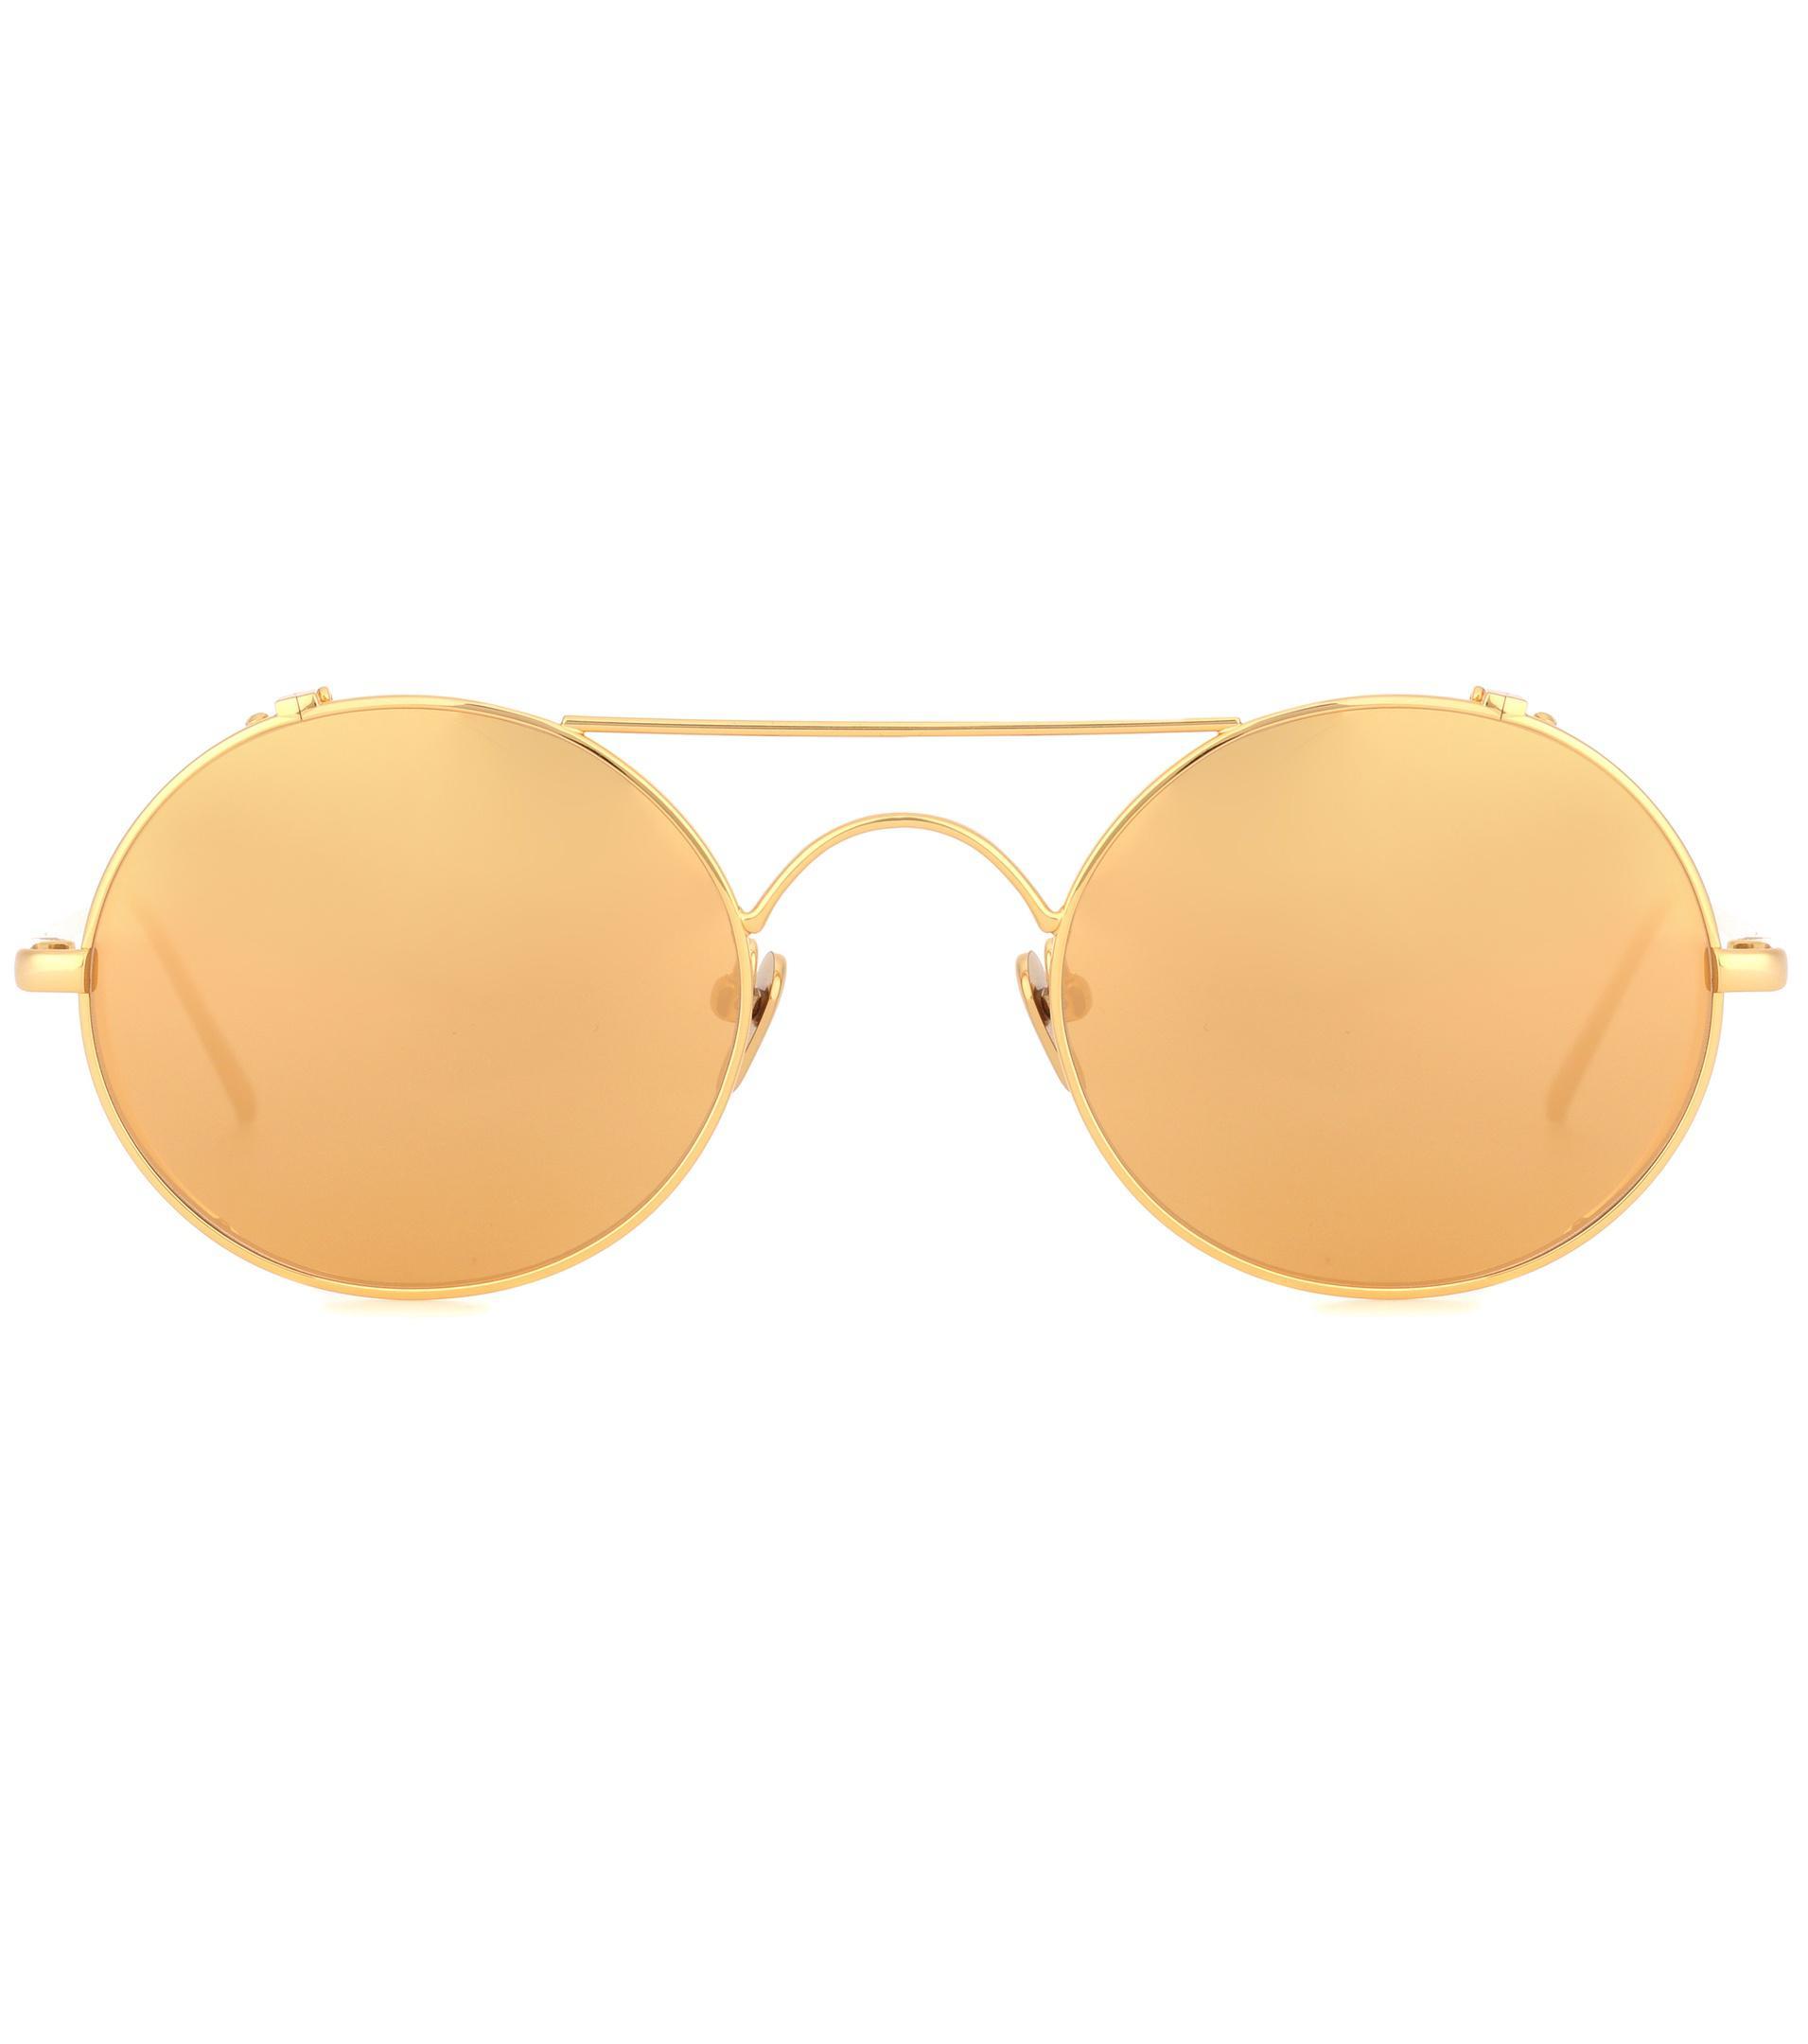 d4536ce9f7c5 Lyst - Linda Farrow 427 C1 Oval Sunglasses In Yellow Gold in Metallic